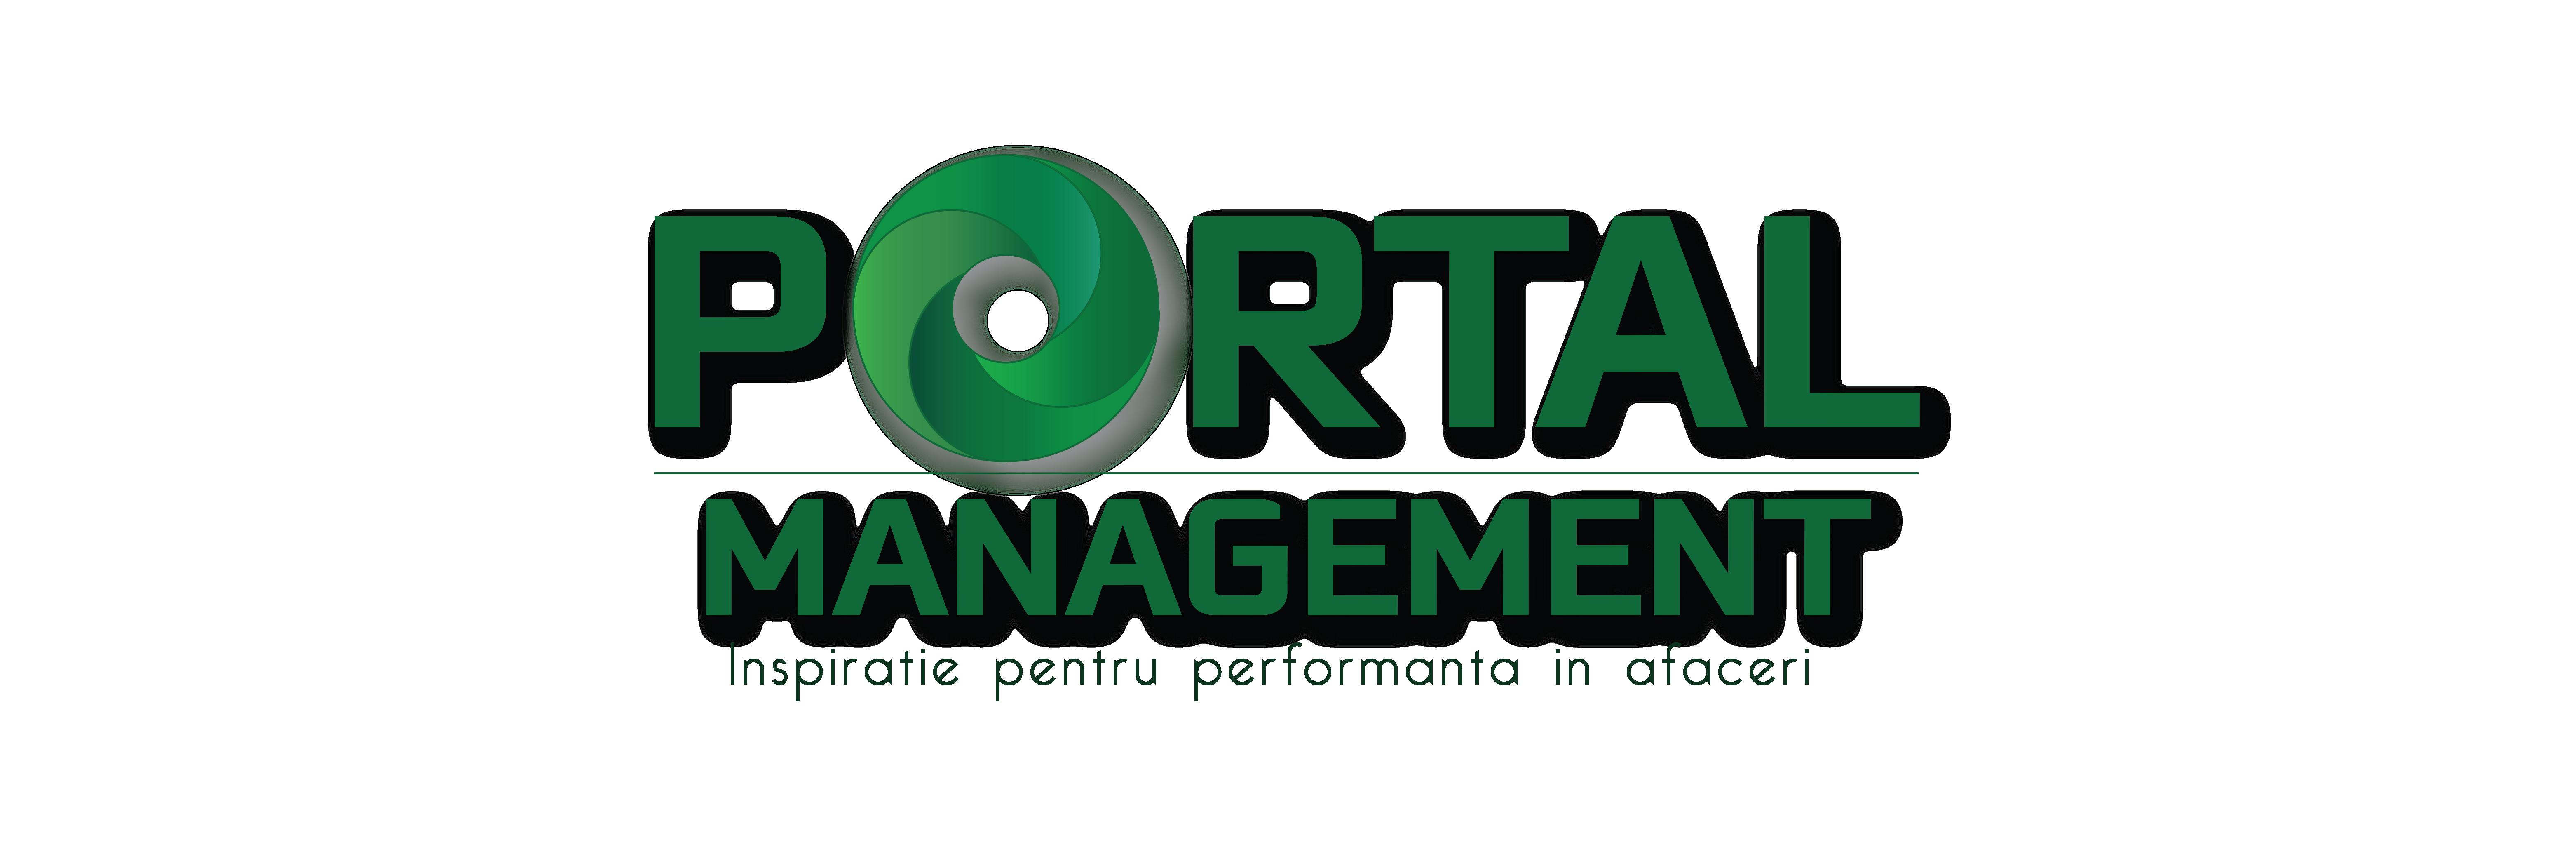 Portal Management – Inspiratie pentru performanta in afaceri